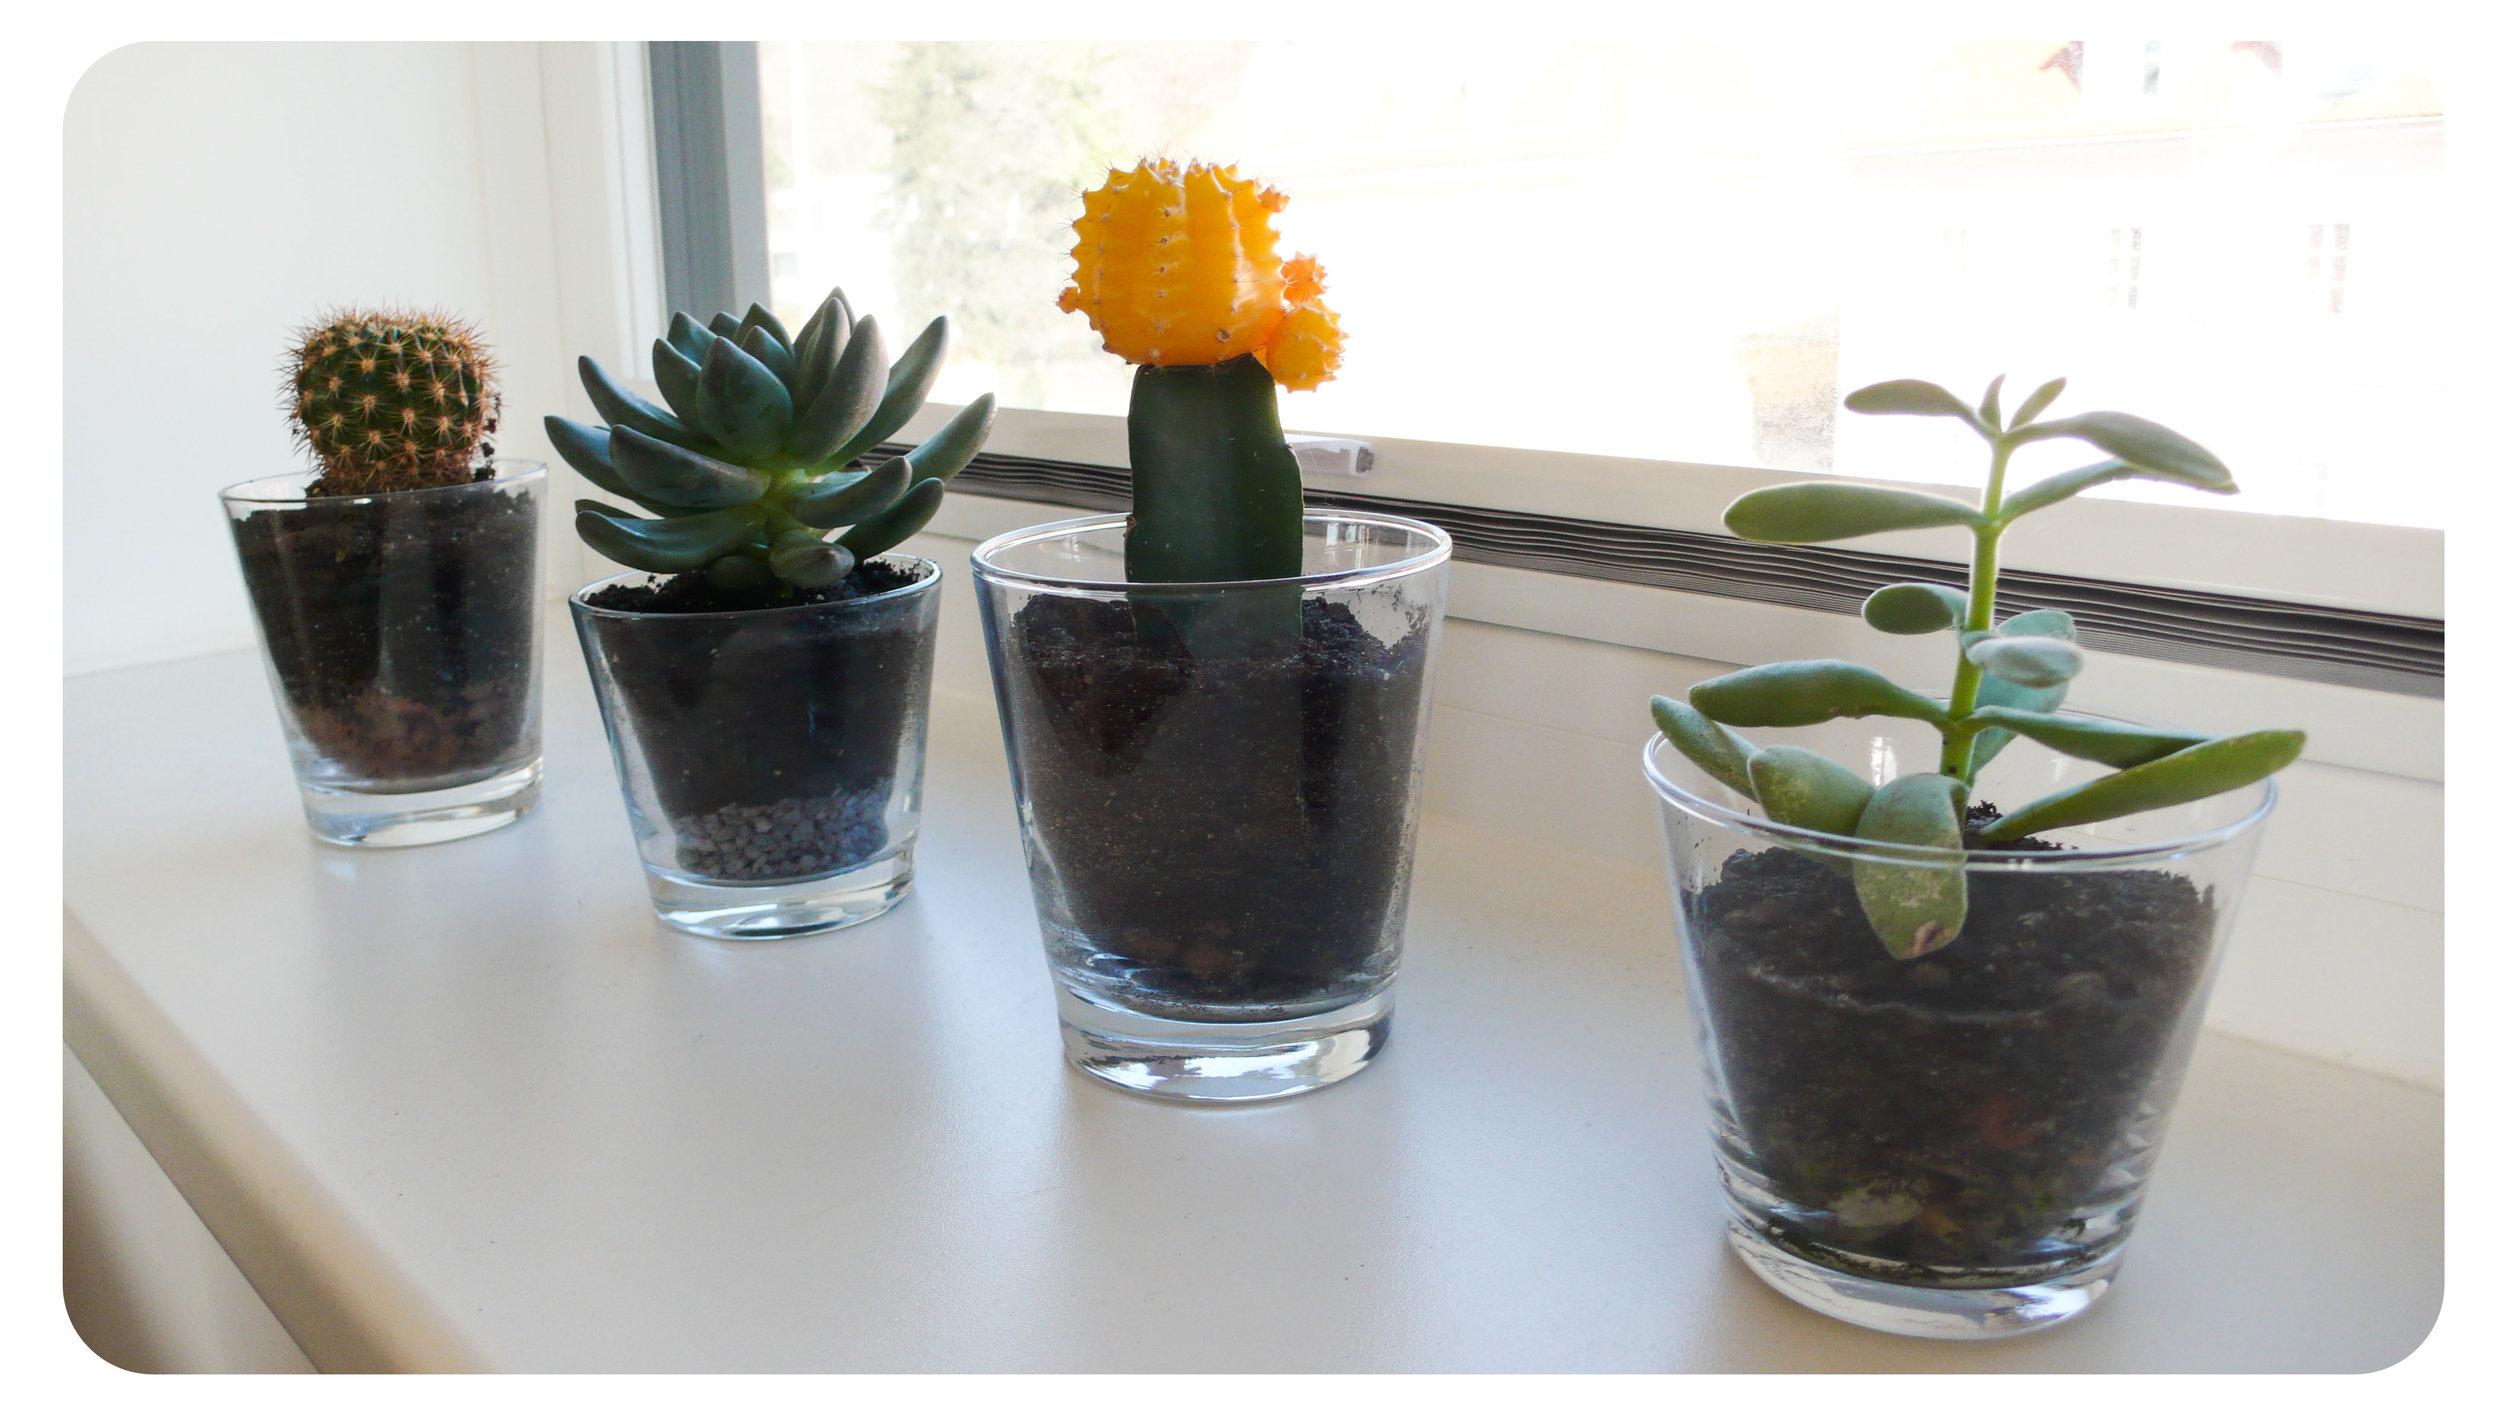 cactei_succulents.jpg